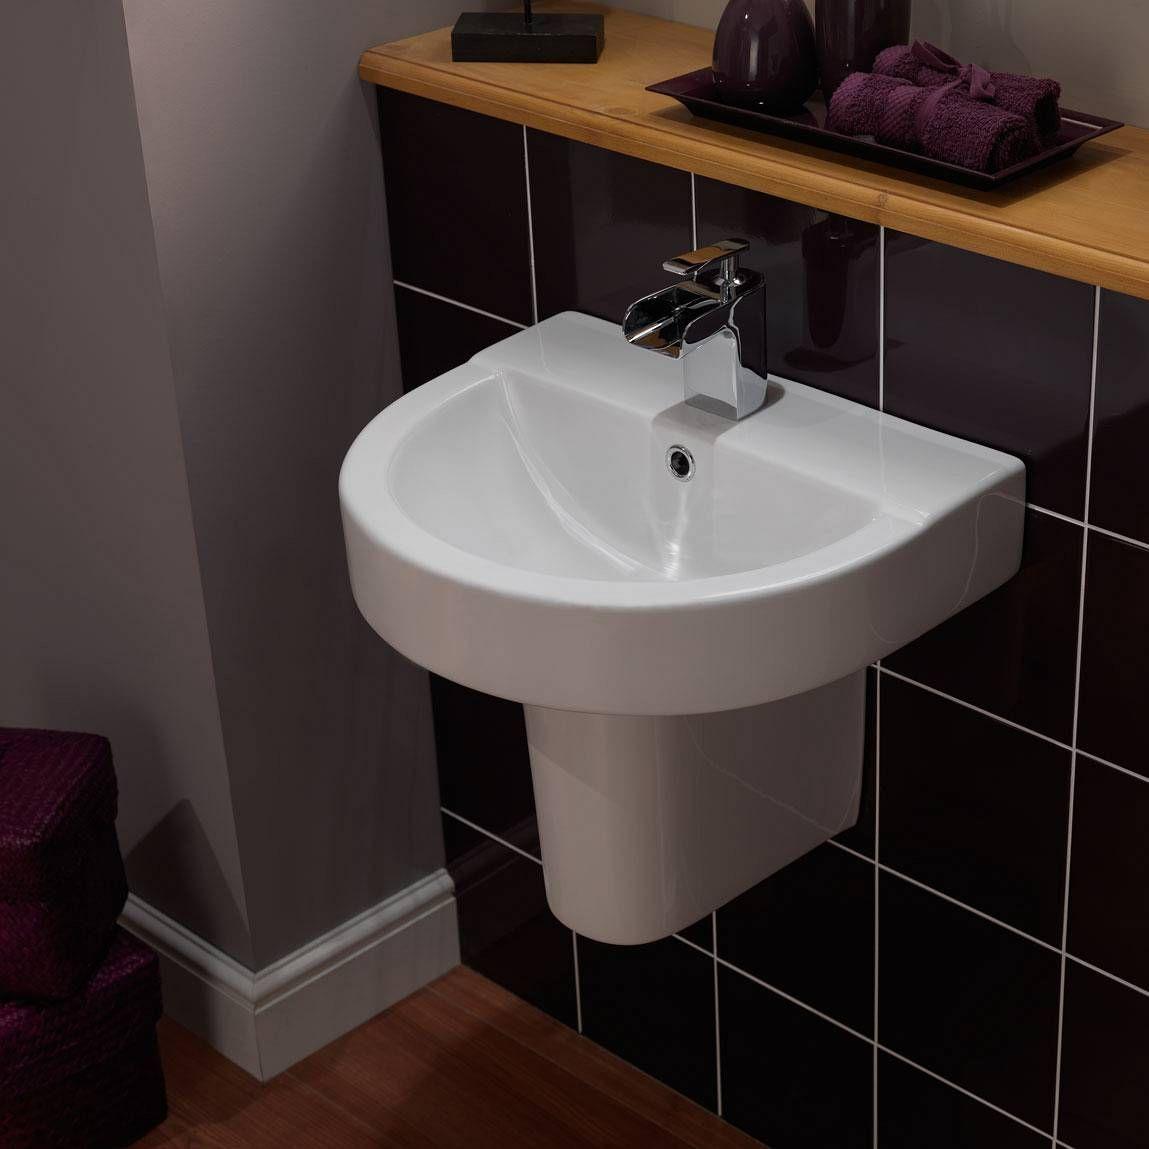 Sorrento Basin & Semi Pedestal Small - https://victoriaplum.com/product/sorrento-basin-amp-pedestal-large-bsn170